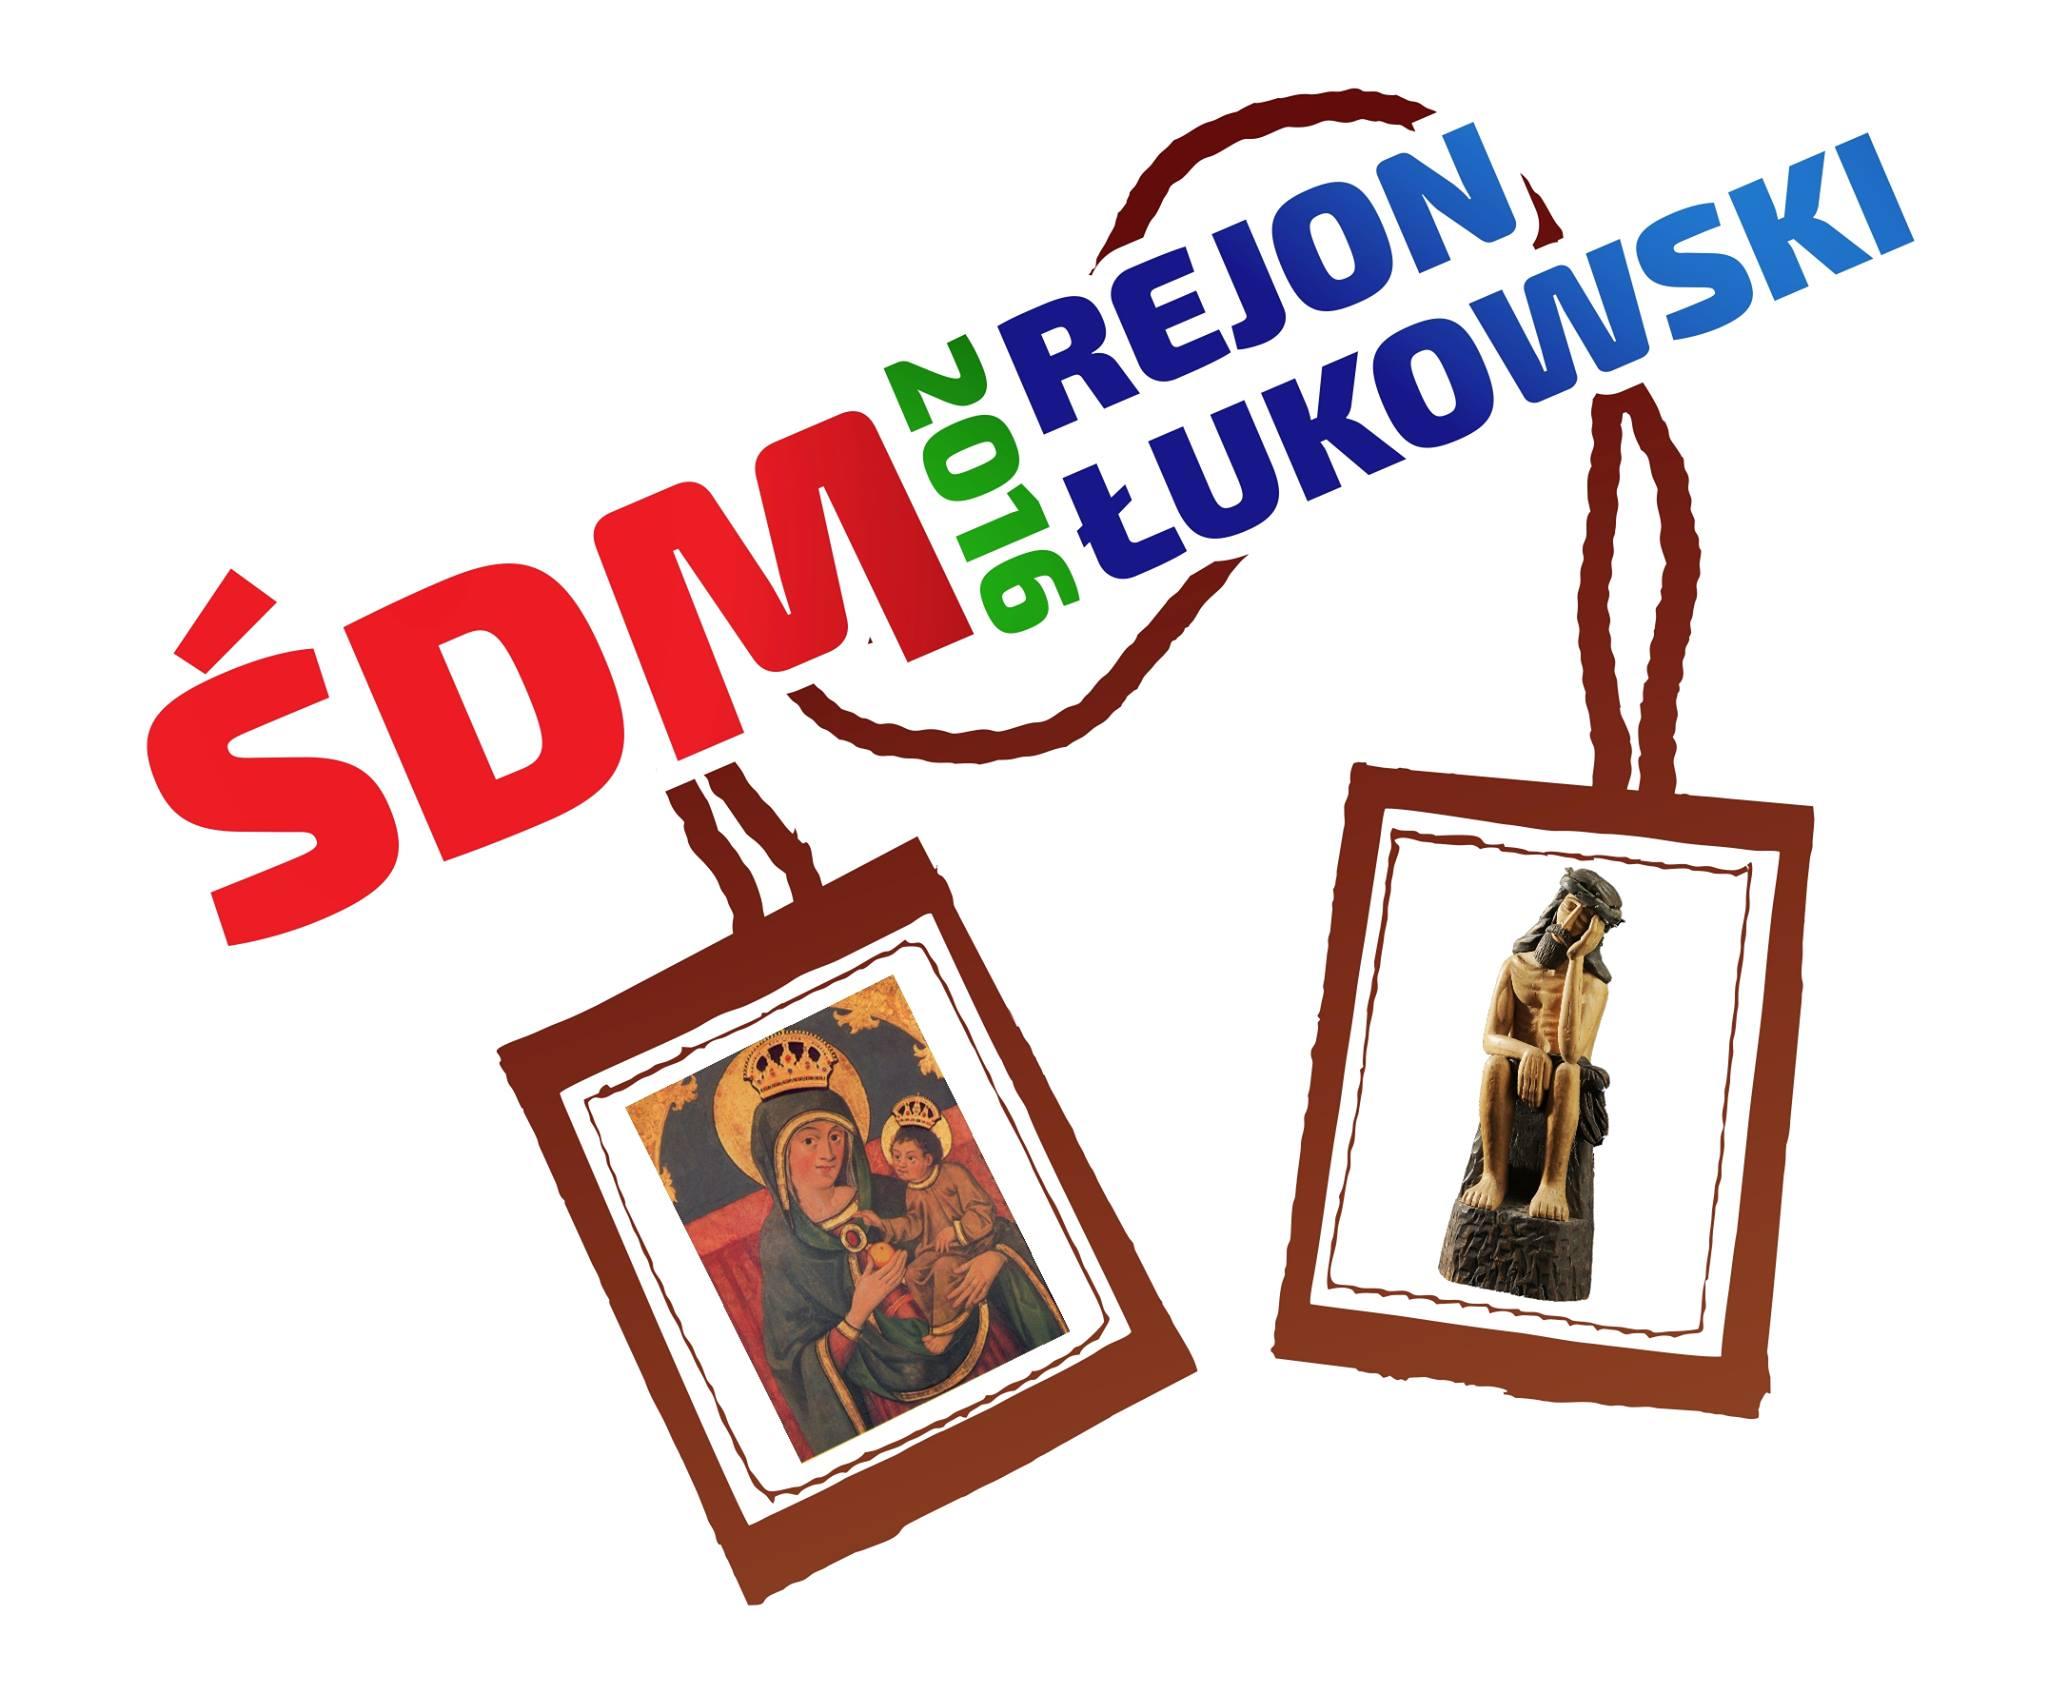 ŚDM Wola Gułowska